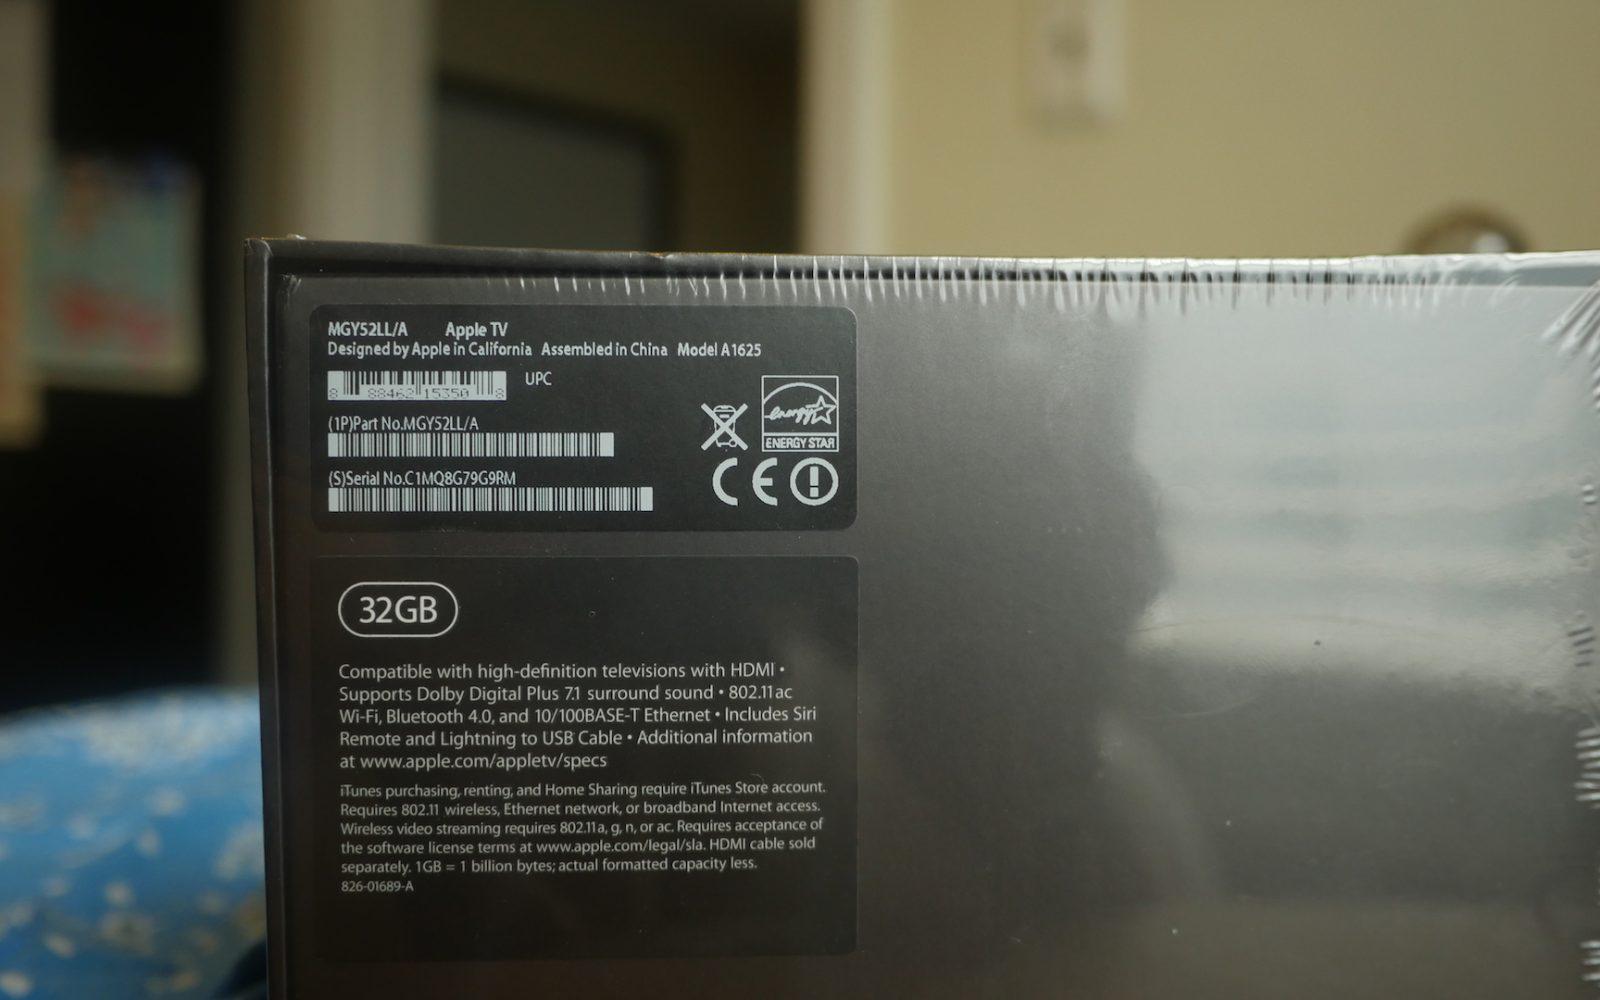 CleanMyMac X 4 2 0 serial key